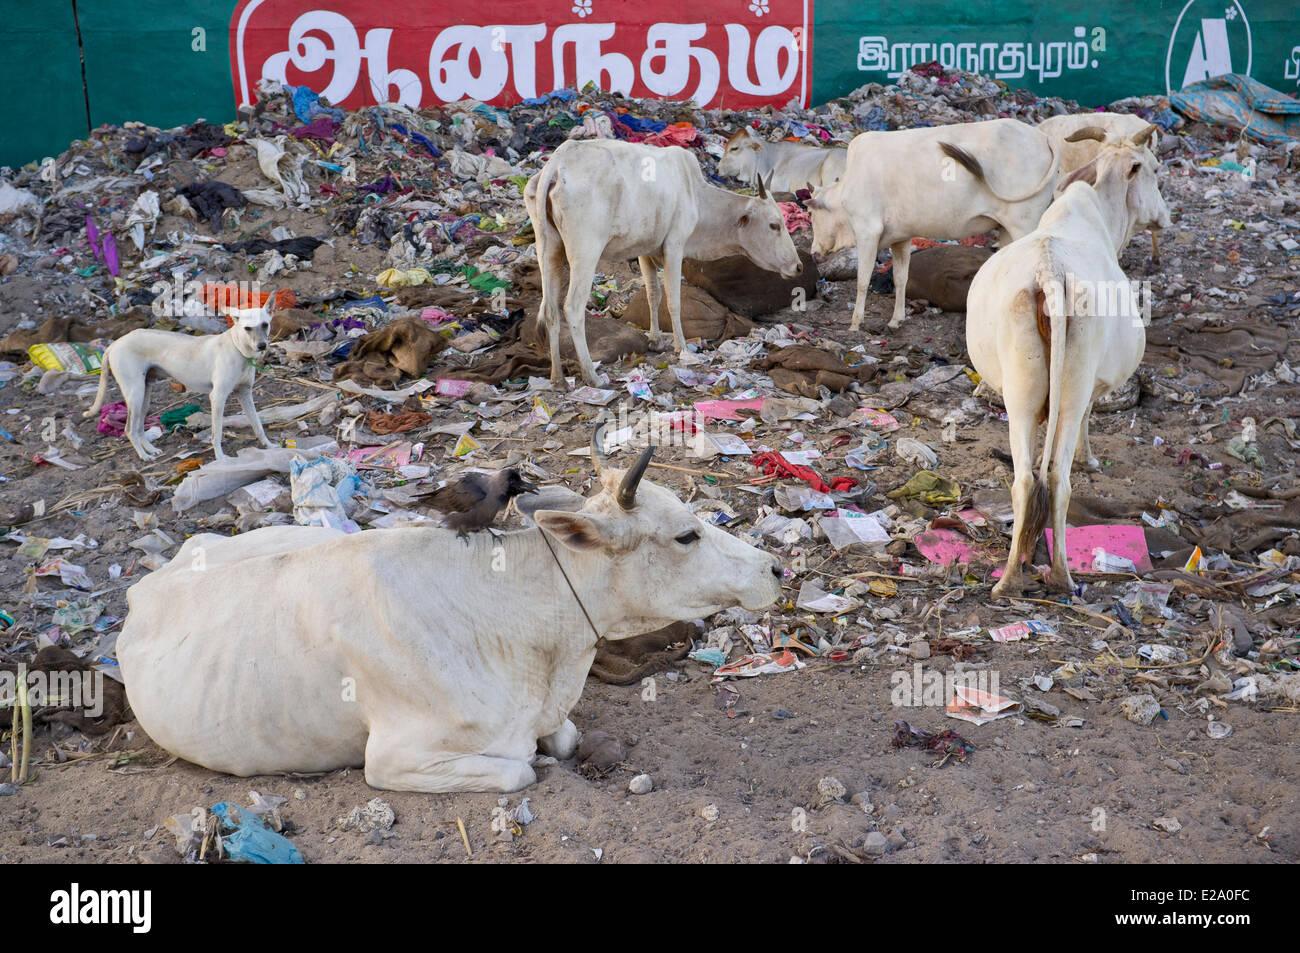 India, Tamil Nadu state, Rameswaram, cows in the garbage - Stock Image